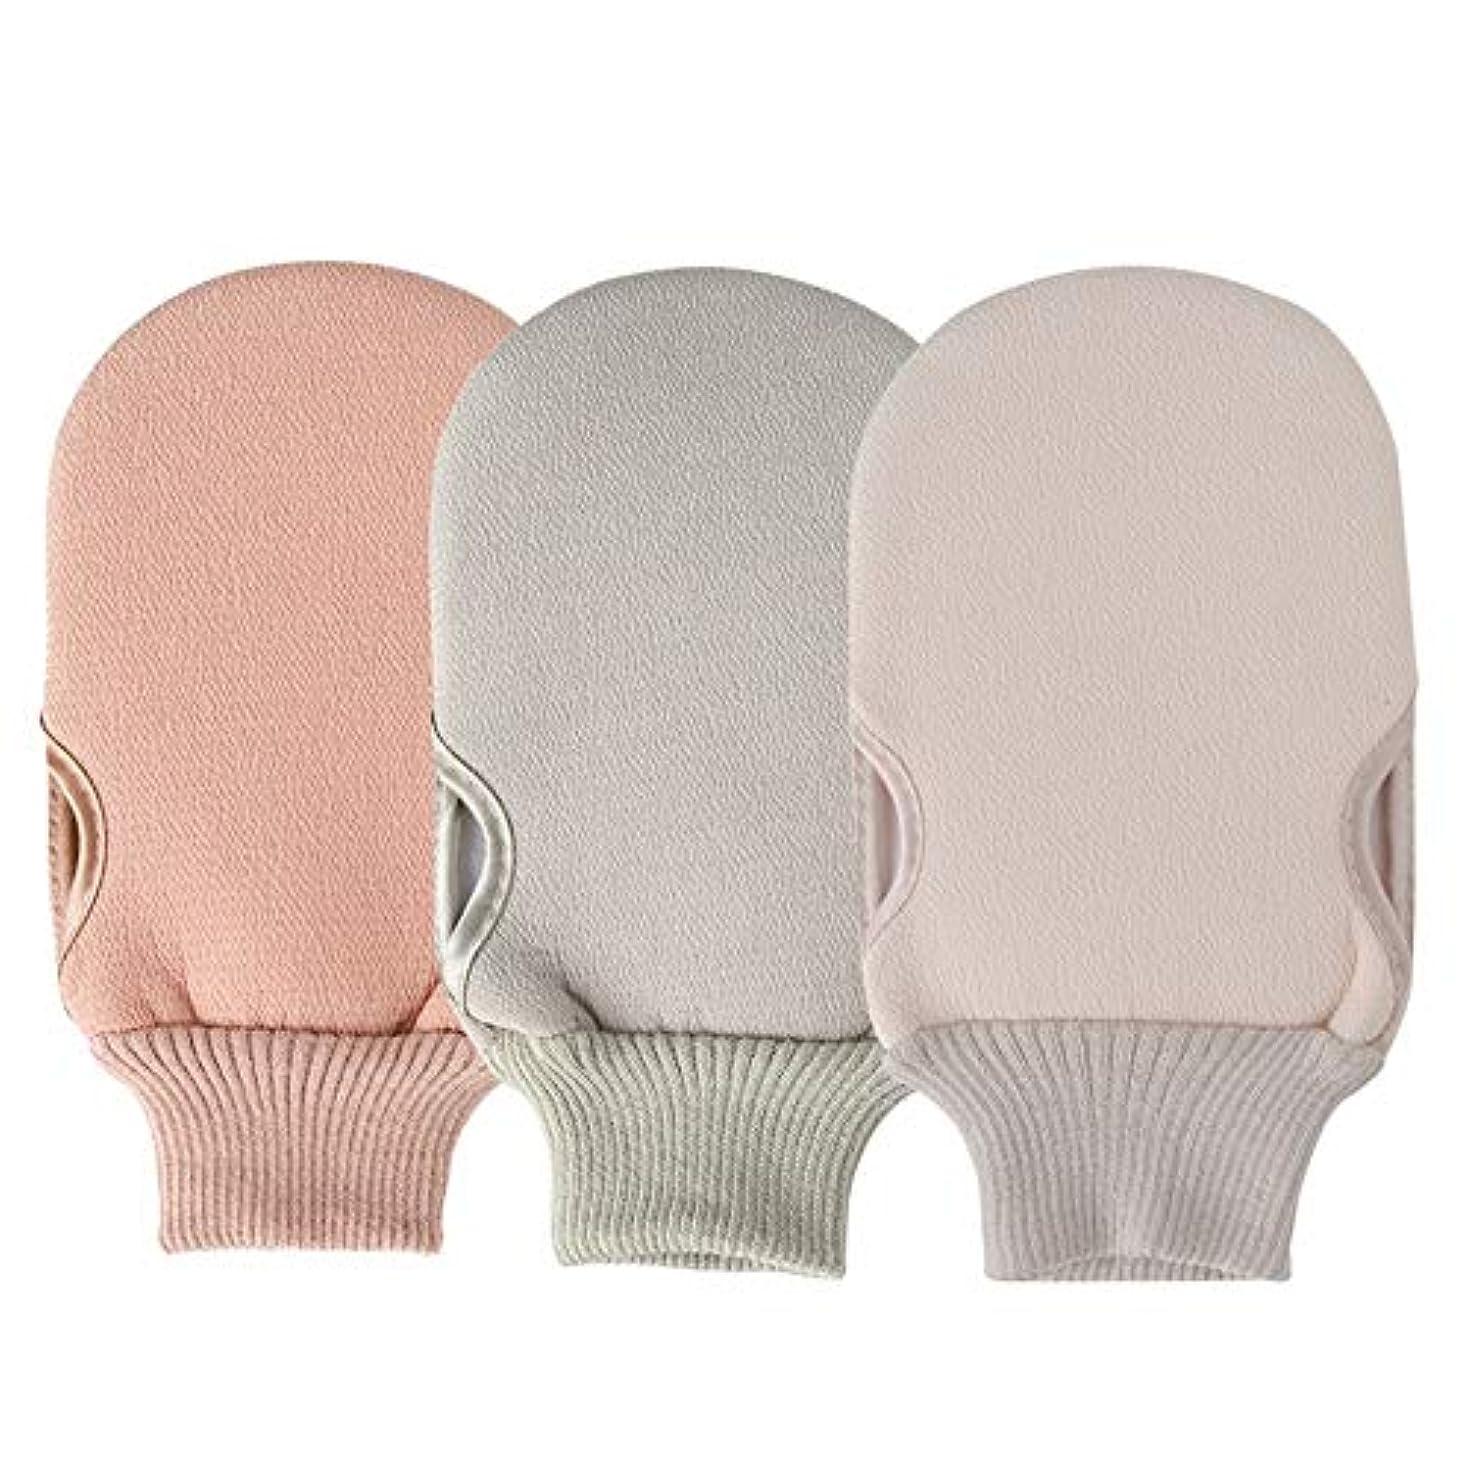 BTXXYJP お風呂用手袋 あかすり シャワー手袋 ボディブラシ やわらか ボディタオル バス用品 角質除去 (Color : Pink+green+beige)